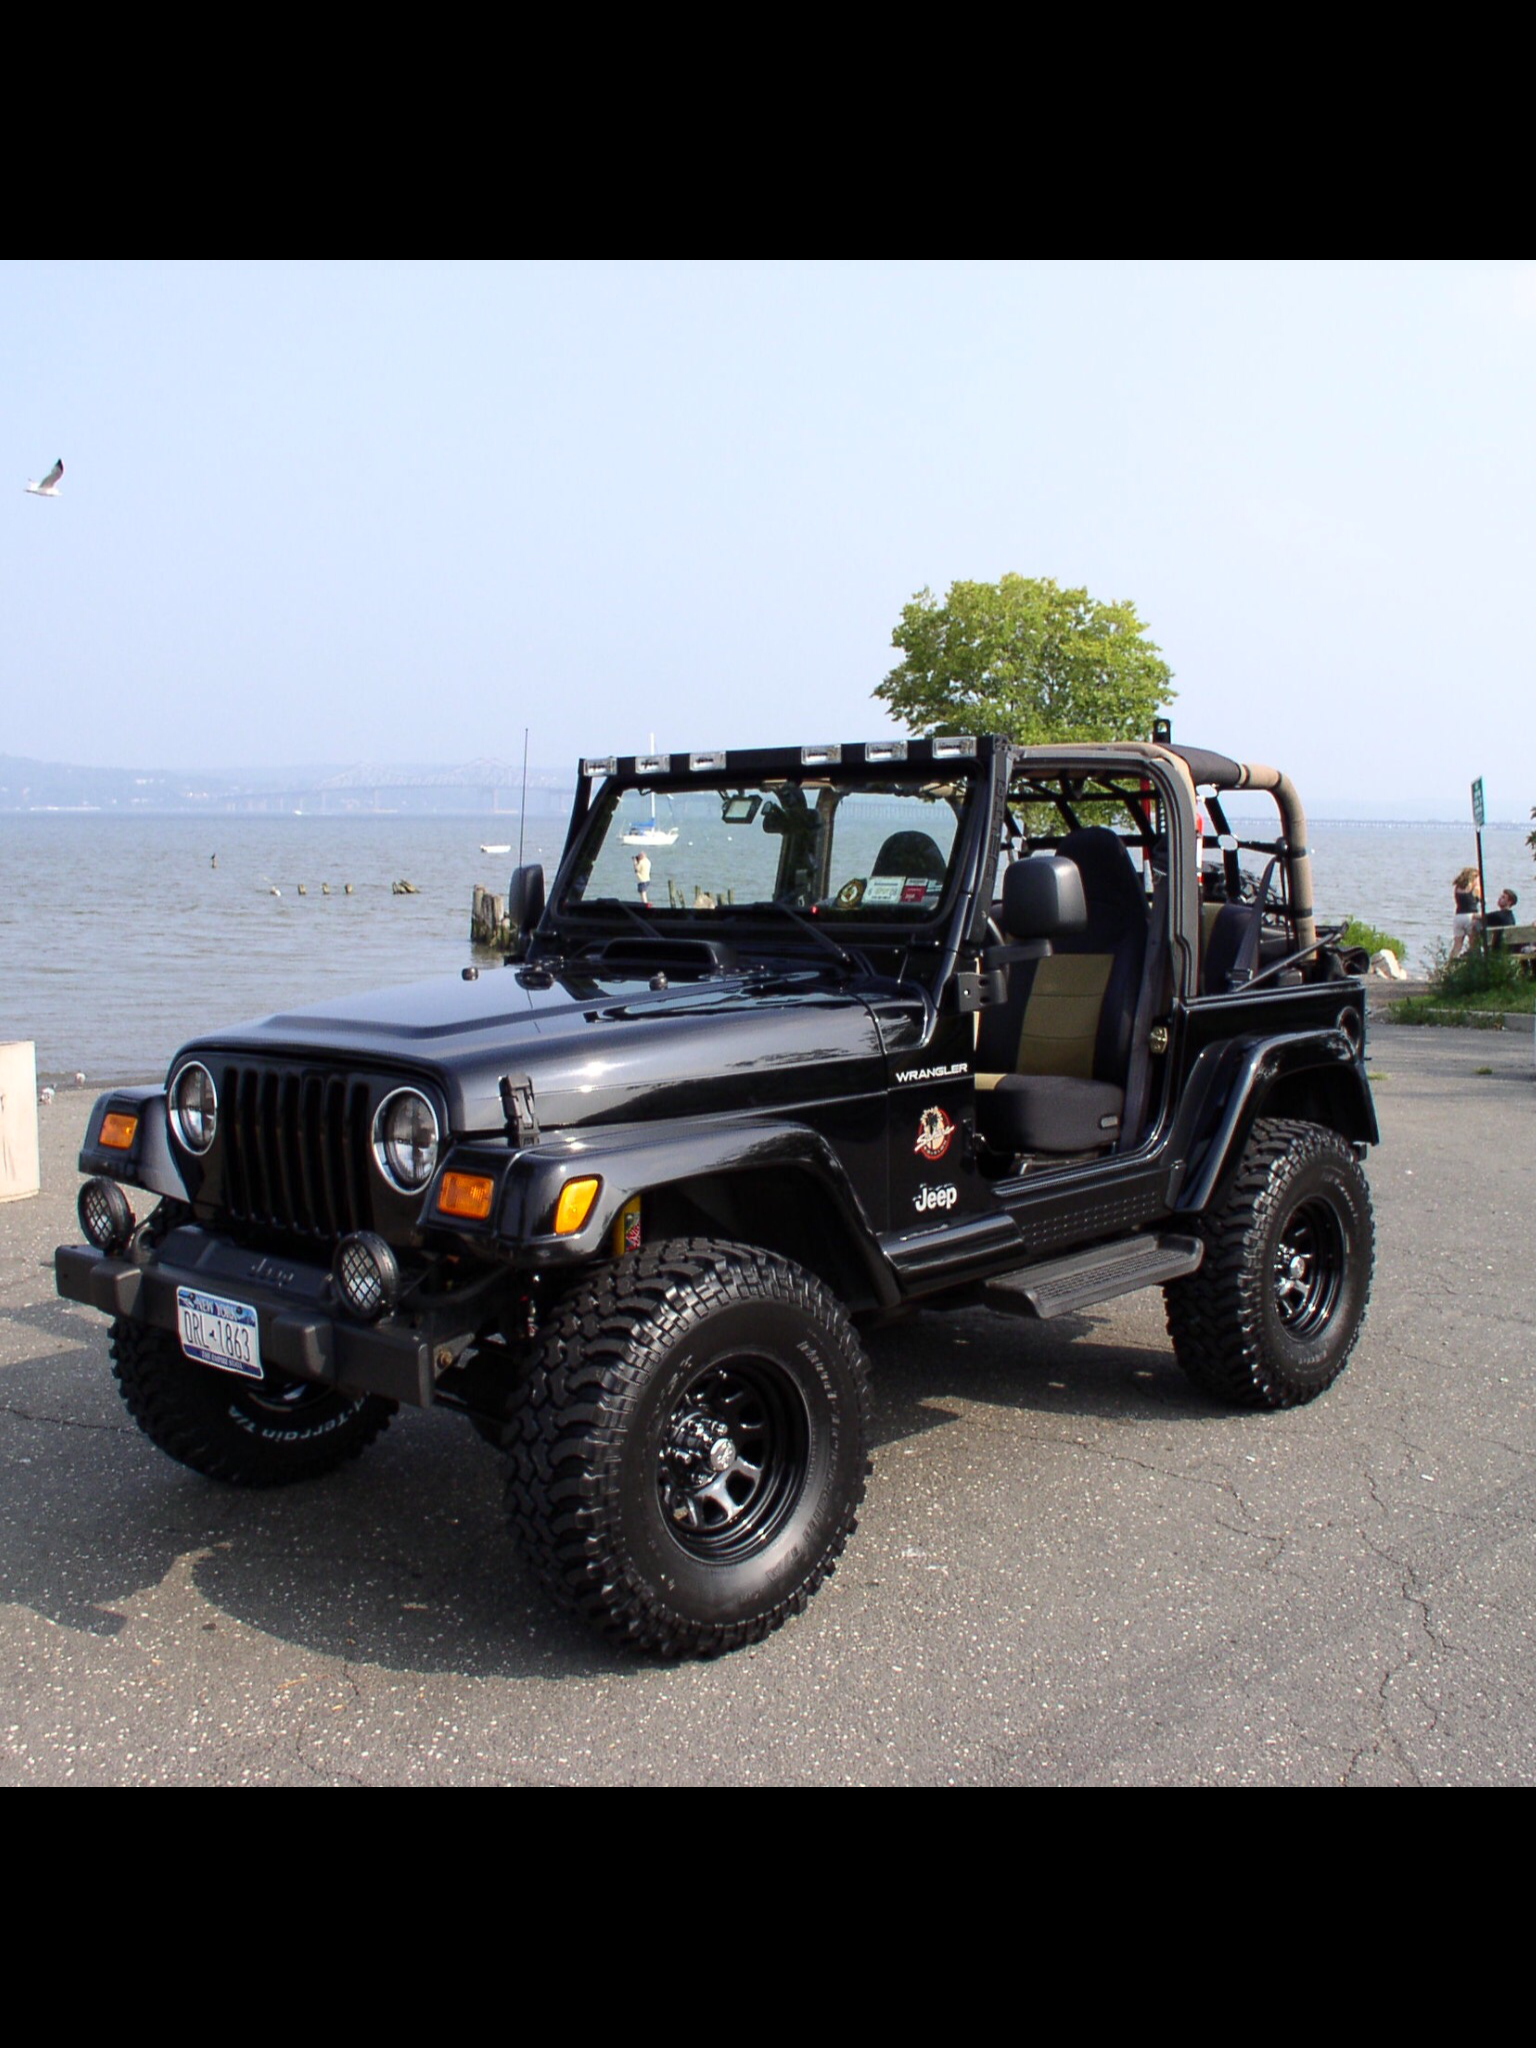 2009 Jeep Wrangler Rubicon Sold 2009 Jeep Wrangler Jeep